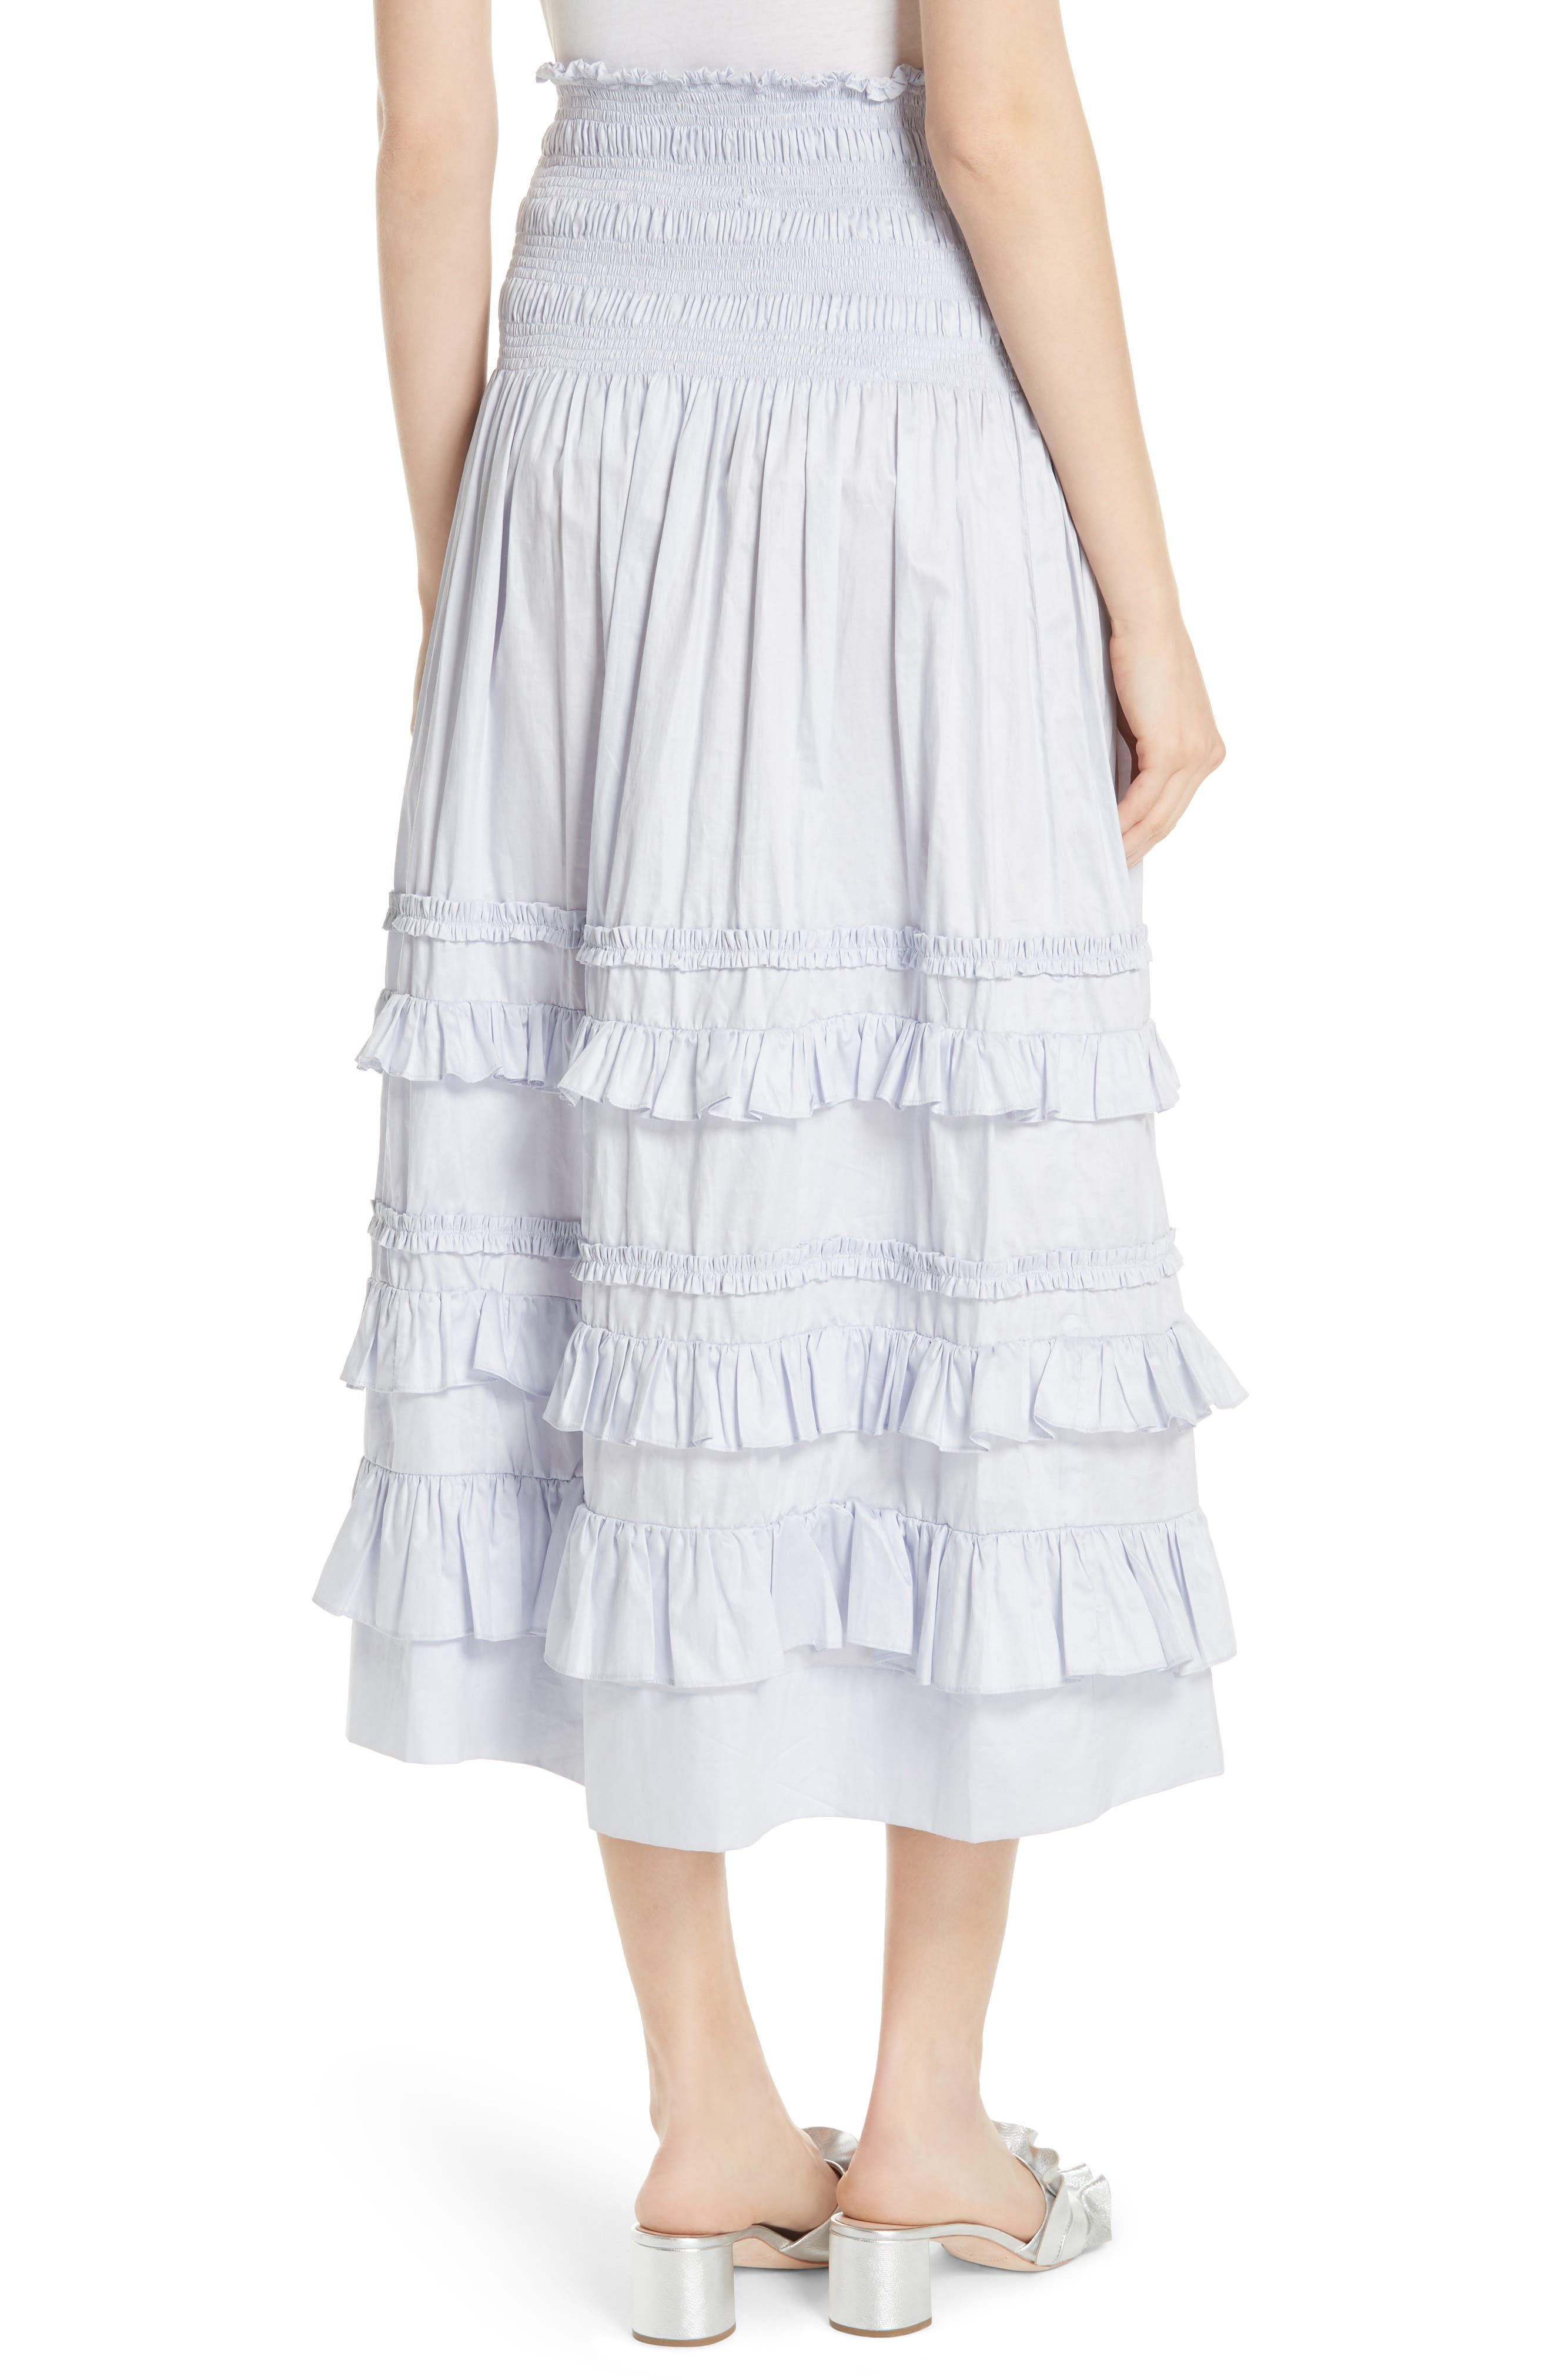 REBECCA TAYLOR, Ruffle Trim Midi Skirt, Alternate thumbnail 2, color, 458